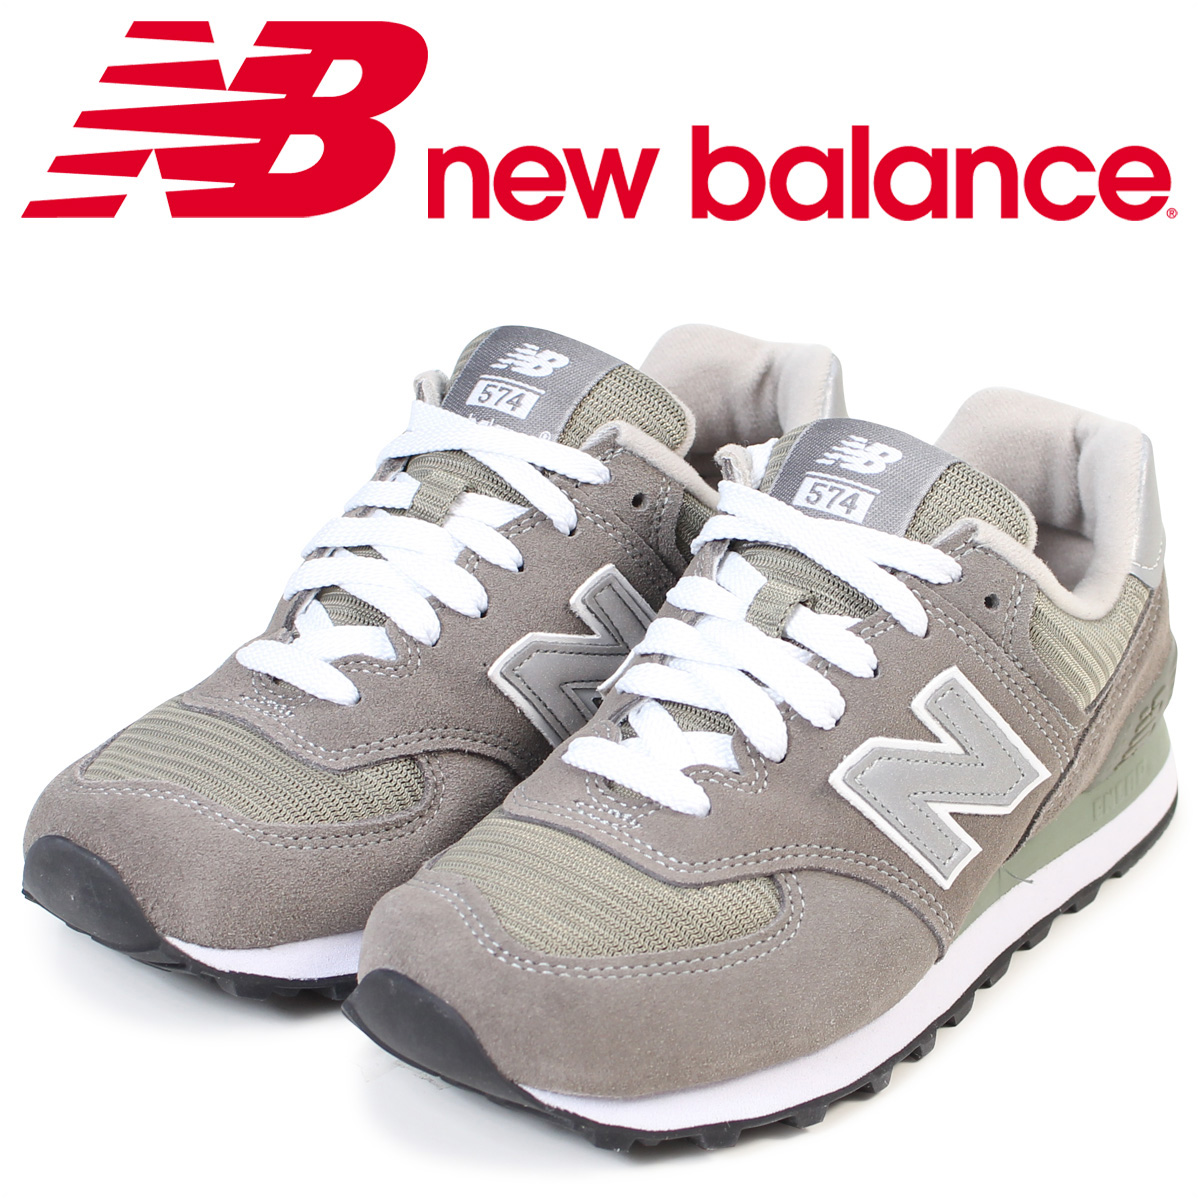 new balance 35 574